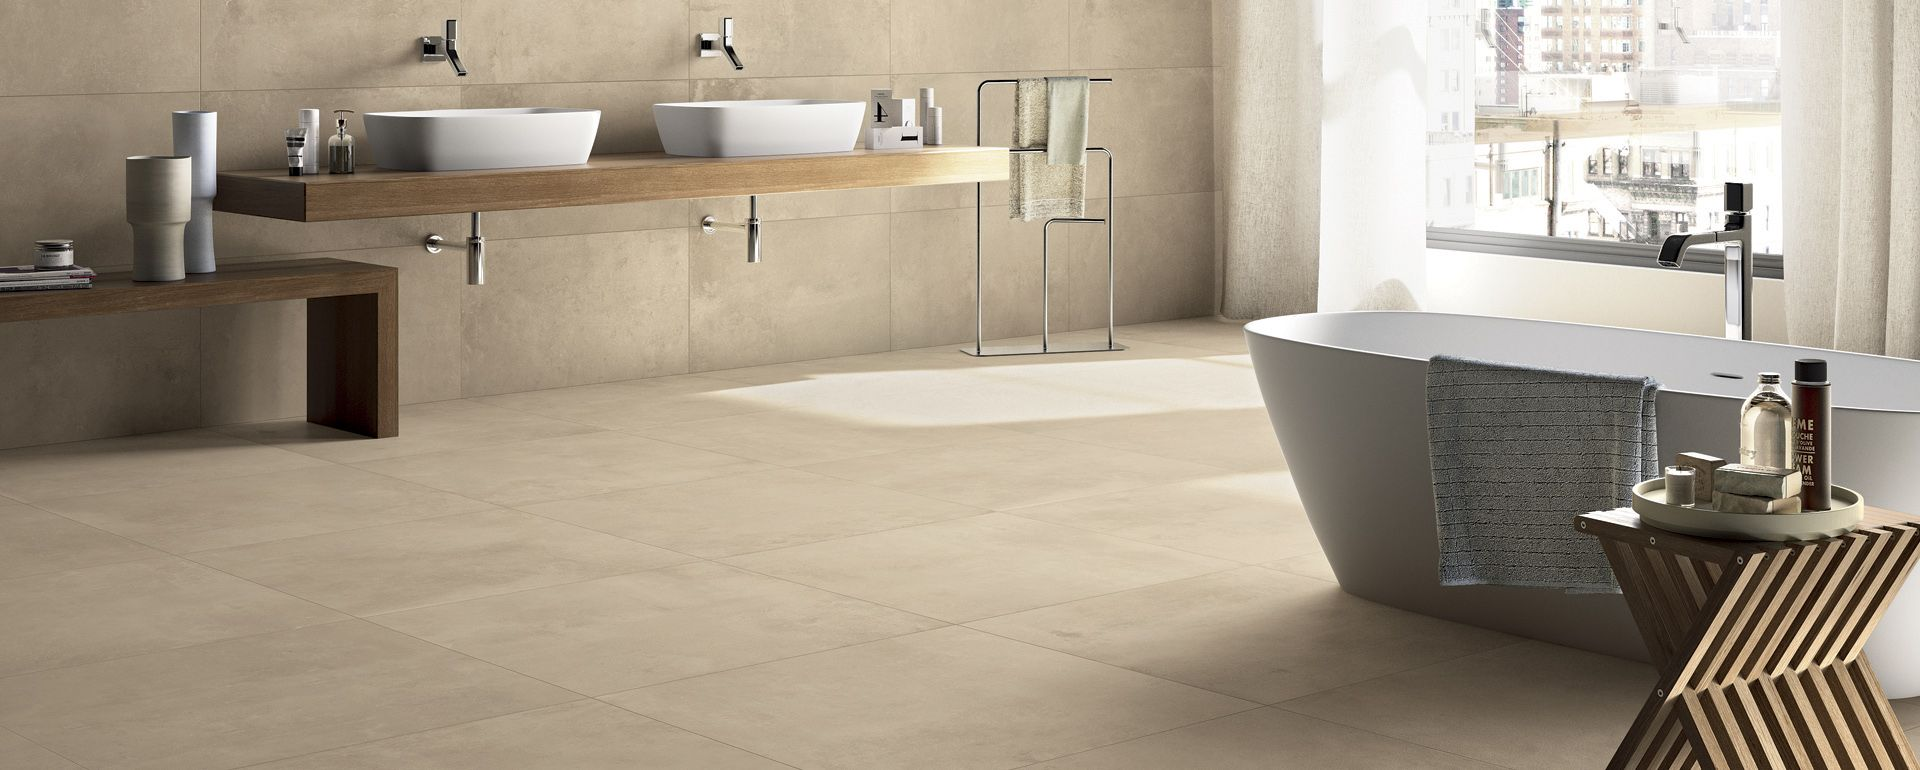 Arizona Tile Porcelain Ceramic And Quartz Cleaning Recommendations Beige Tile Bathroom White Marble Bathrooms Stone Tile Bathroom